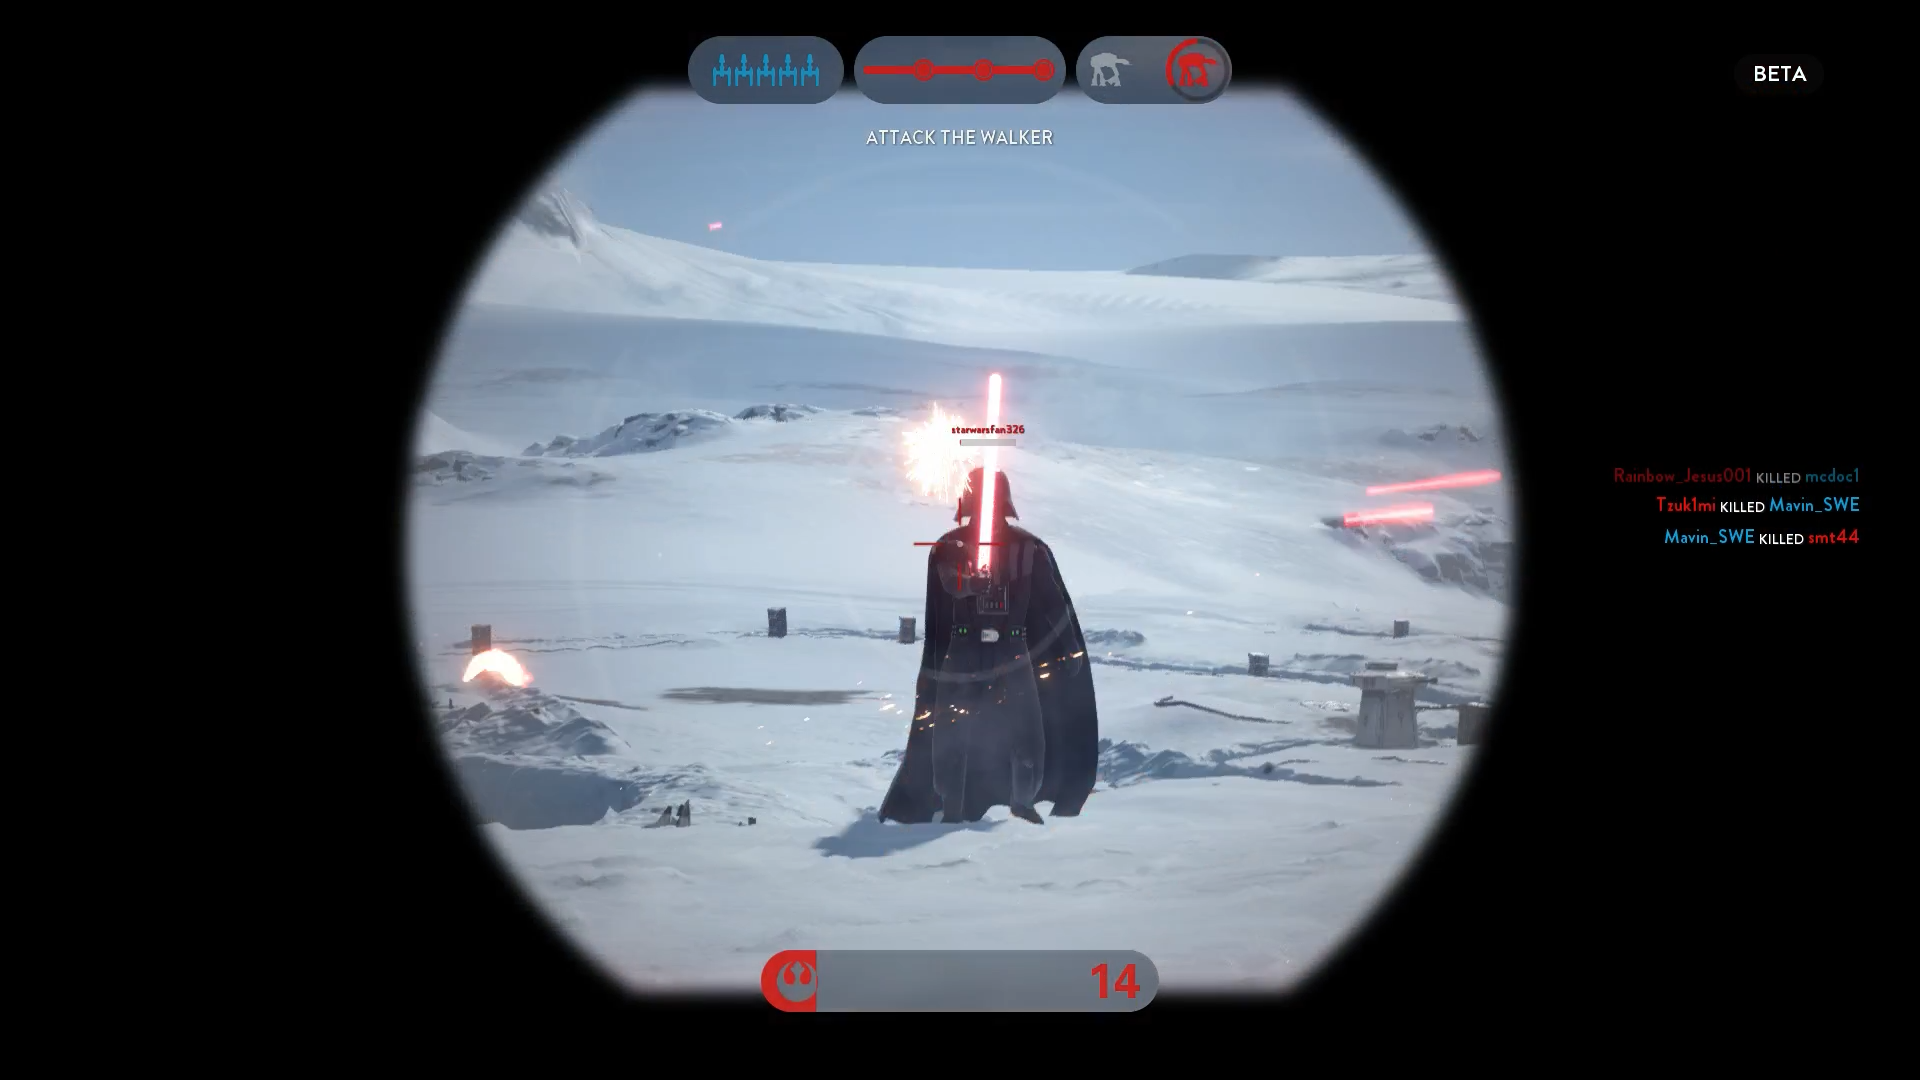 Star Wars: Battlefront aneb DICE trochu jinak 10915